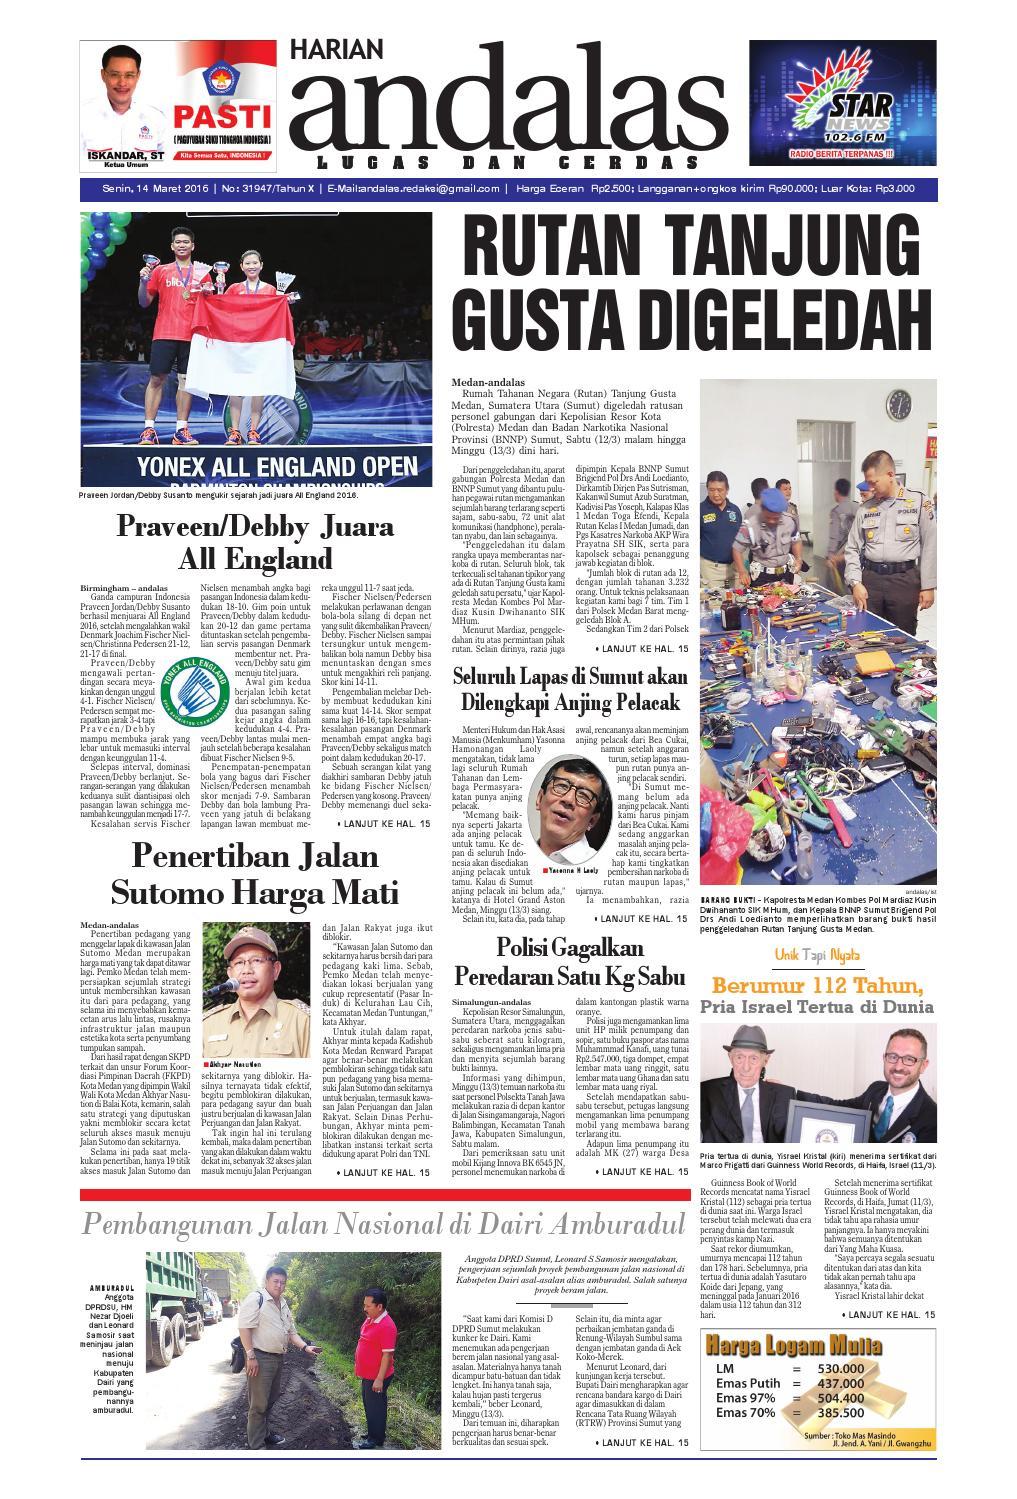 Epaper Andalas Edisi Senin 14 Maret 2016 By Media Issuu Fcenter Lemari Pakaian Wd Hk 1802 Sh Jawa Tengah